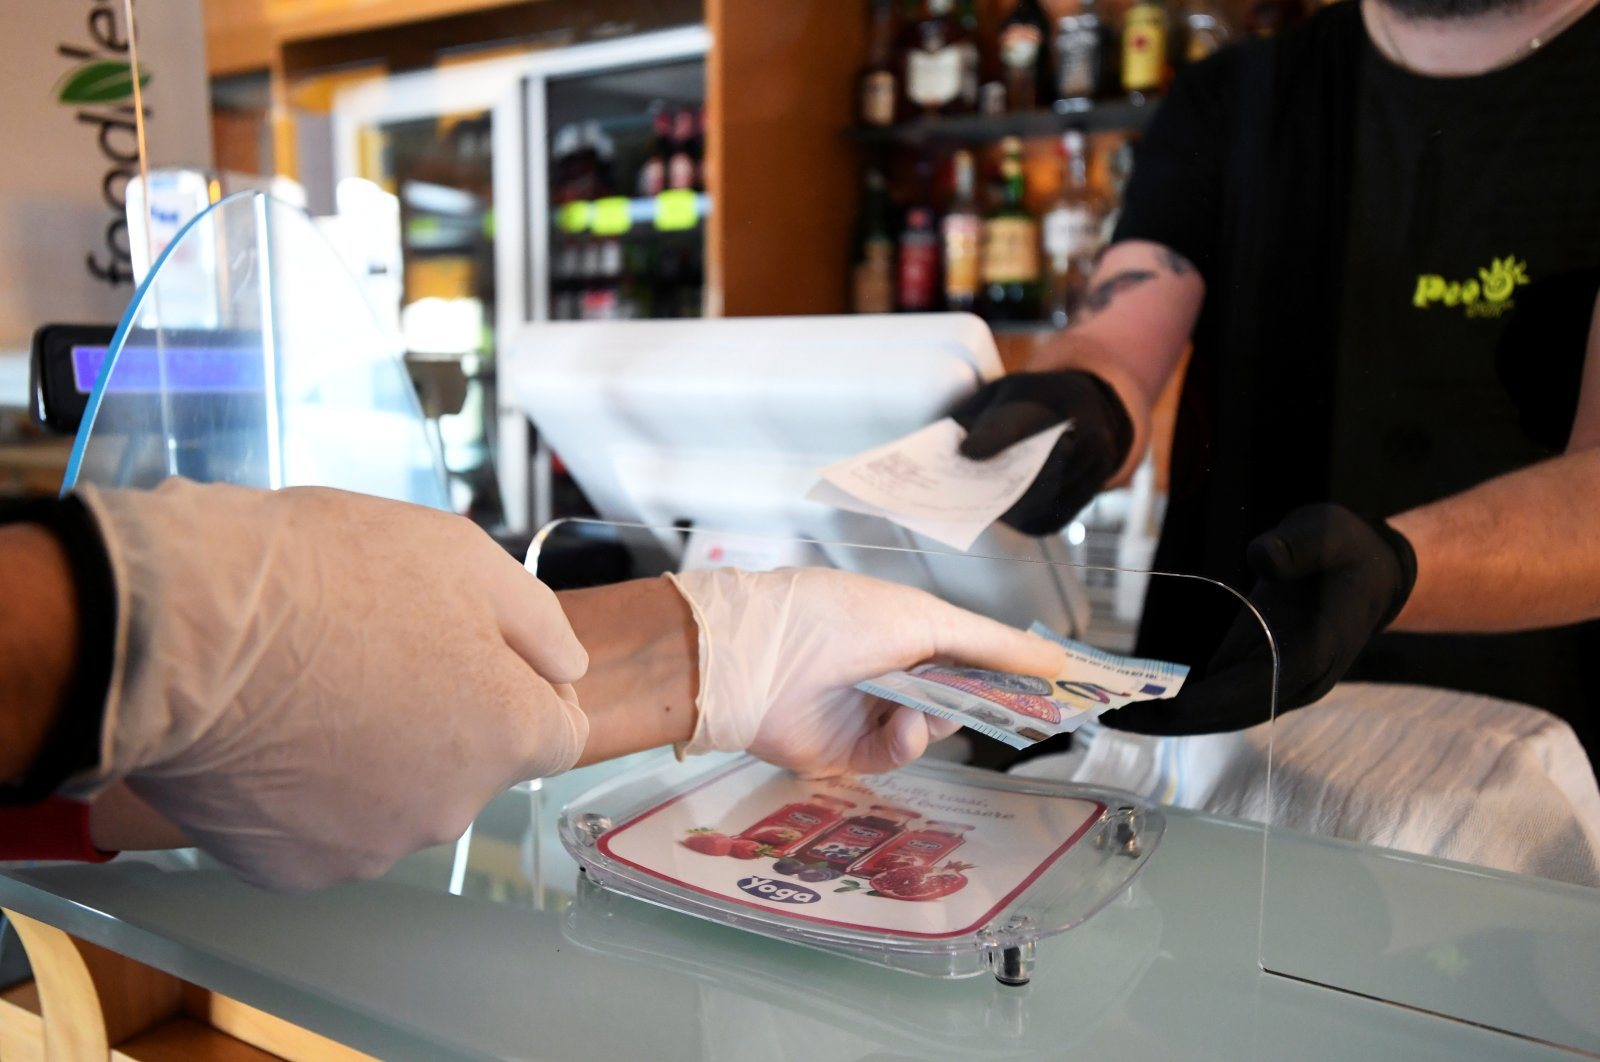 A customer wearing gloves pays cash at a restaurant in Castiglione della Pescaia, Italy, April 27, 2020. (Reuters Photo)